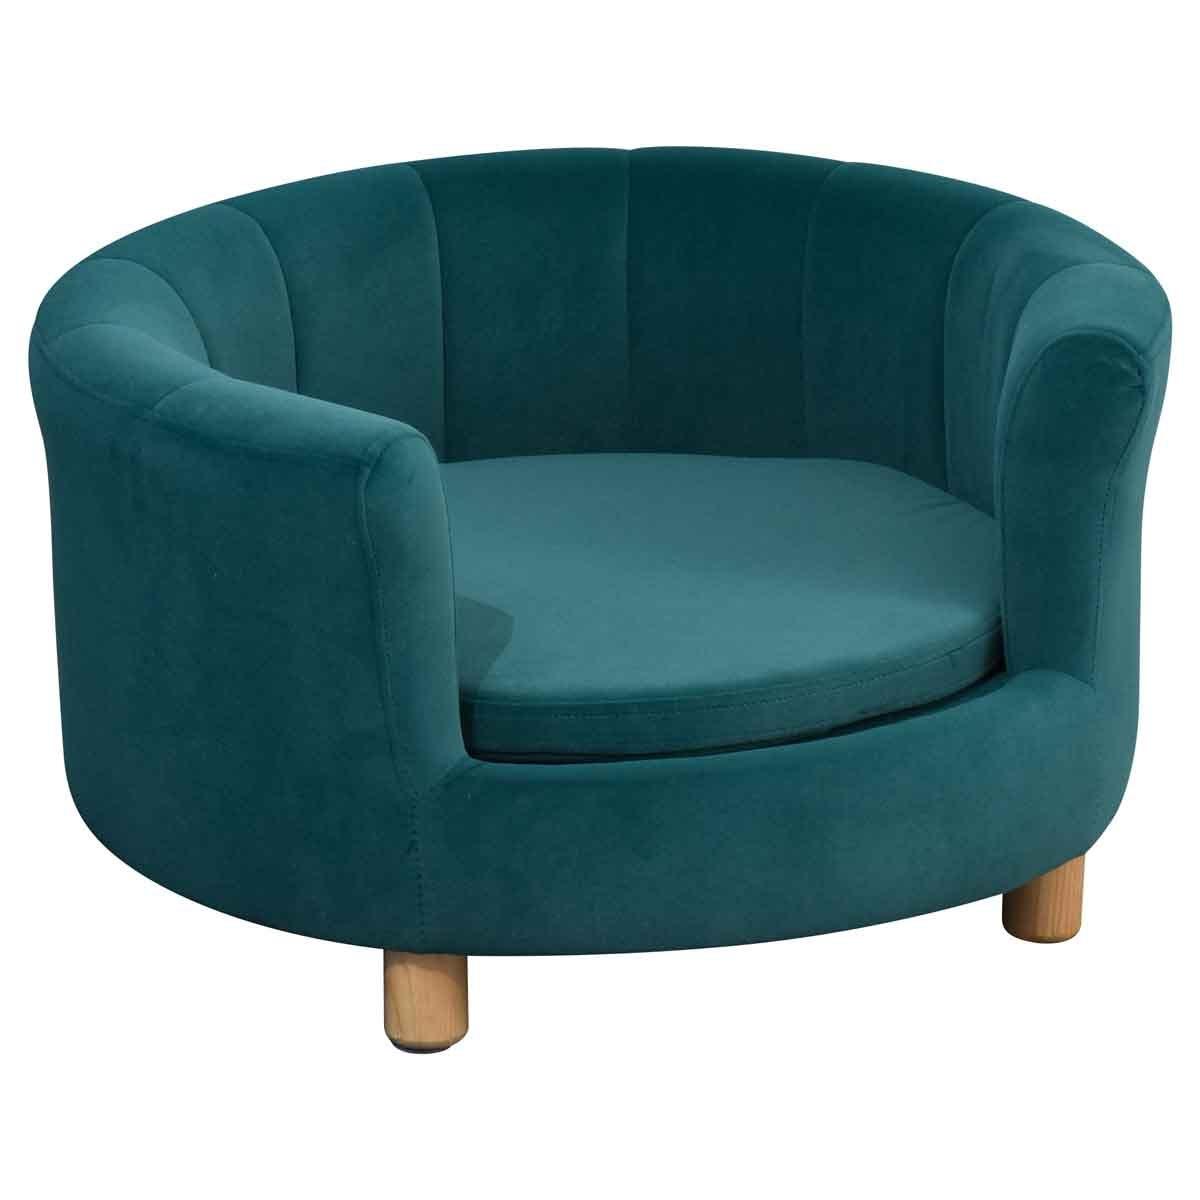 PawHut Modern Nest Shape Cat/Dog Sofa w/Loop Wrapped Backrest - Green